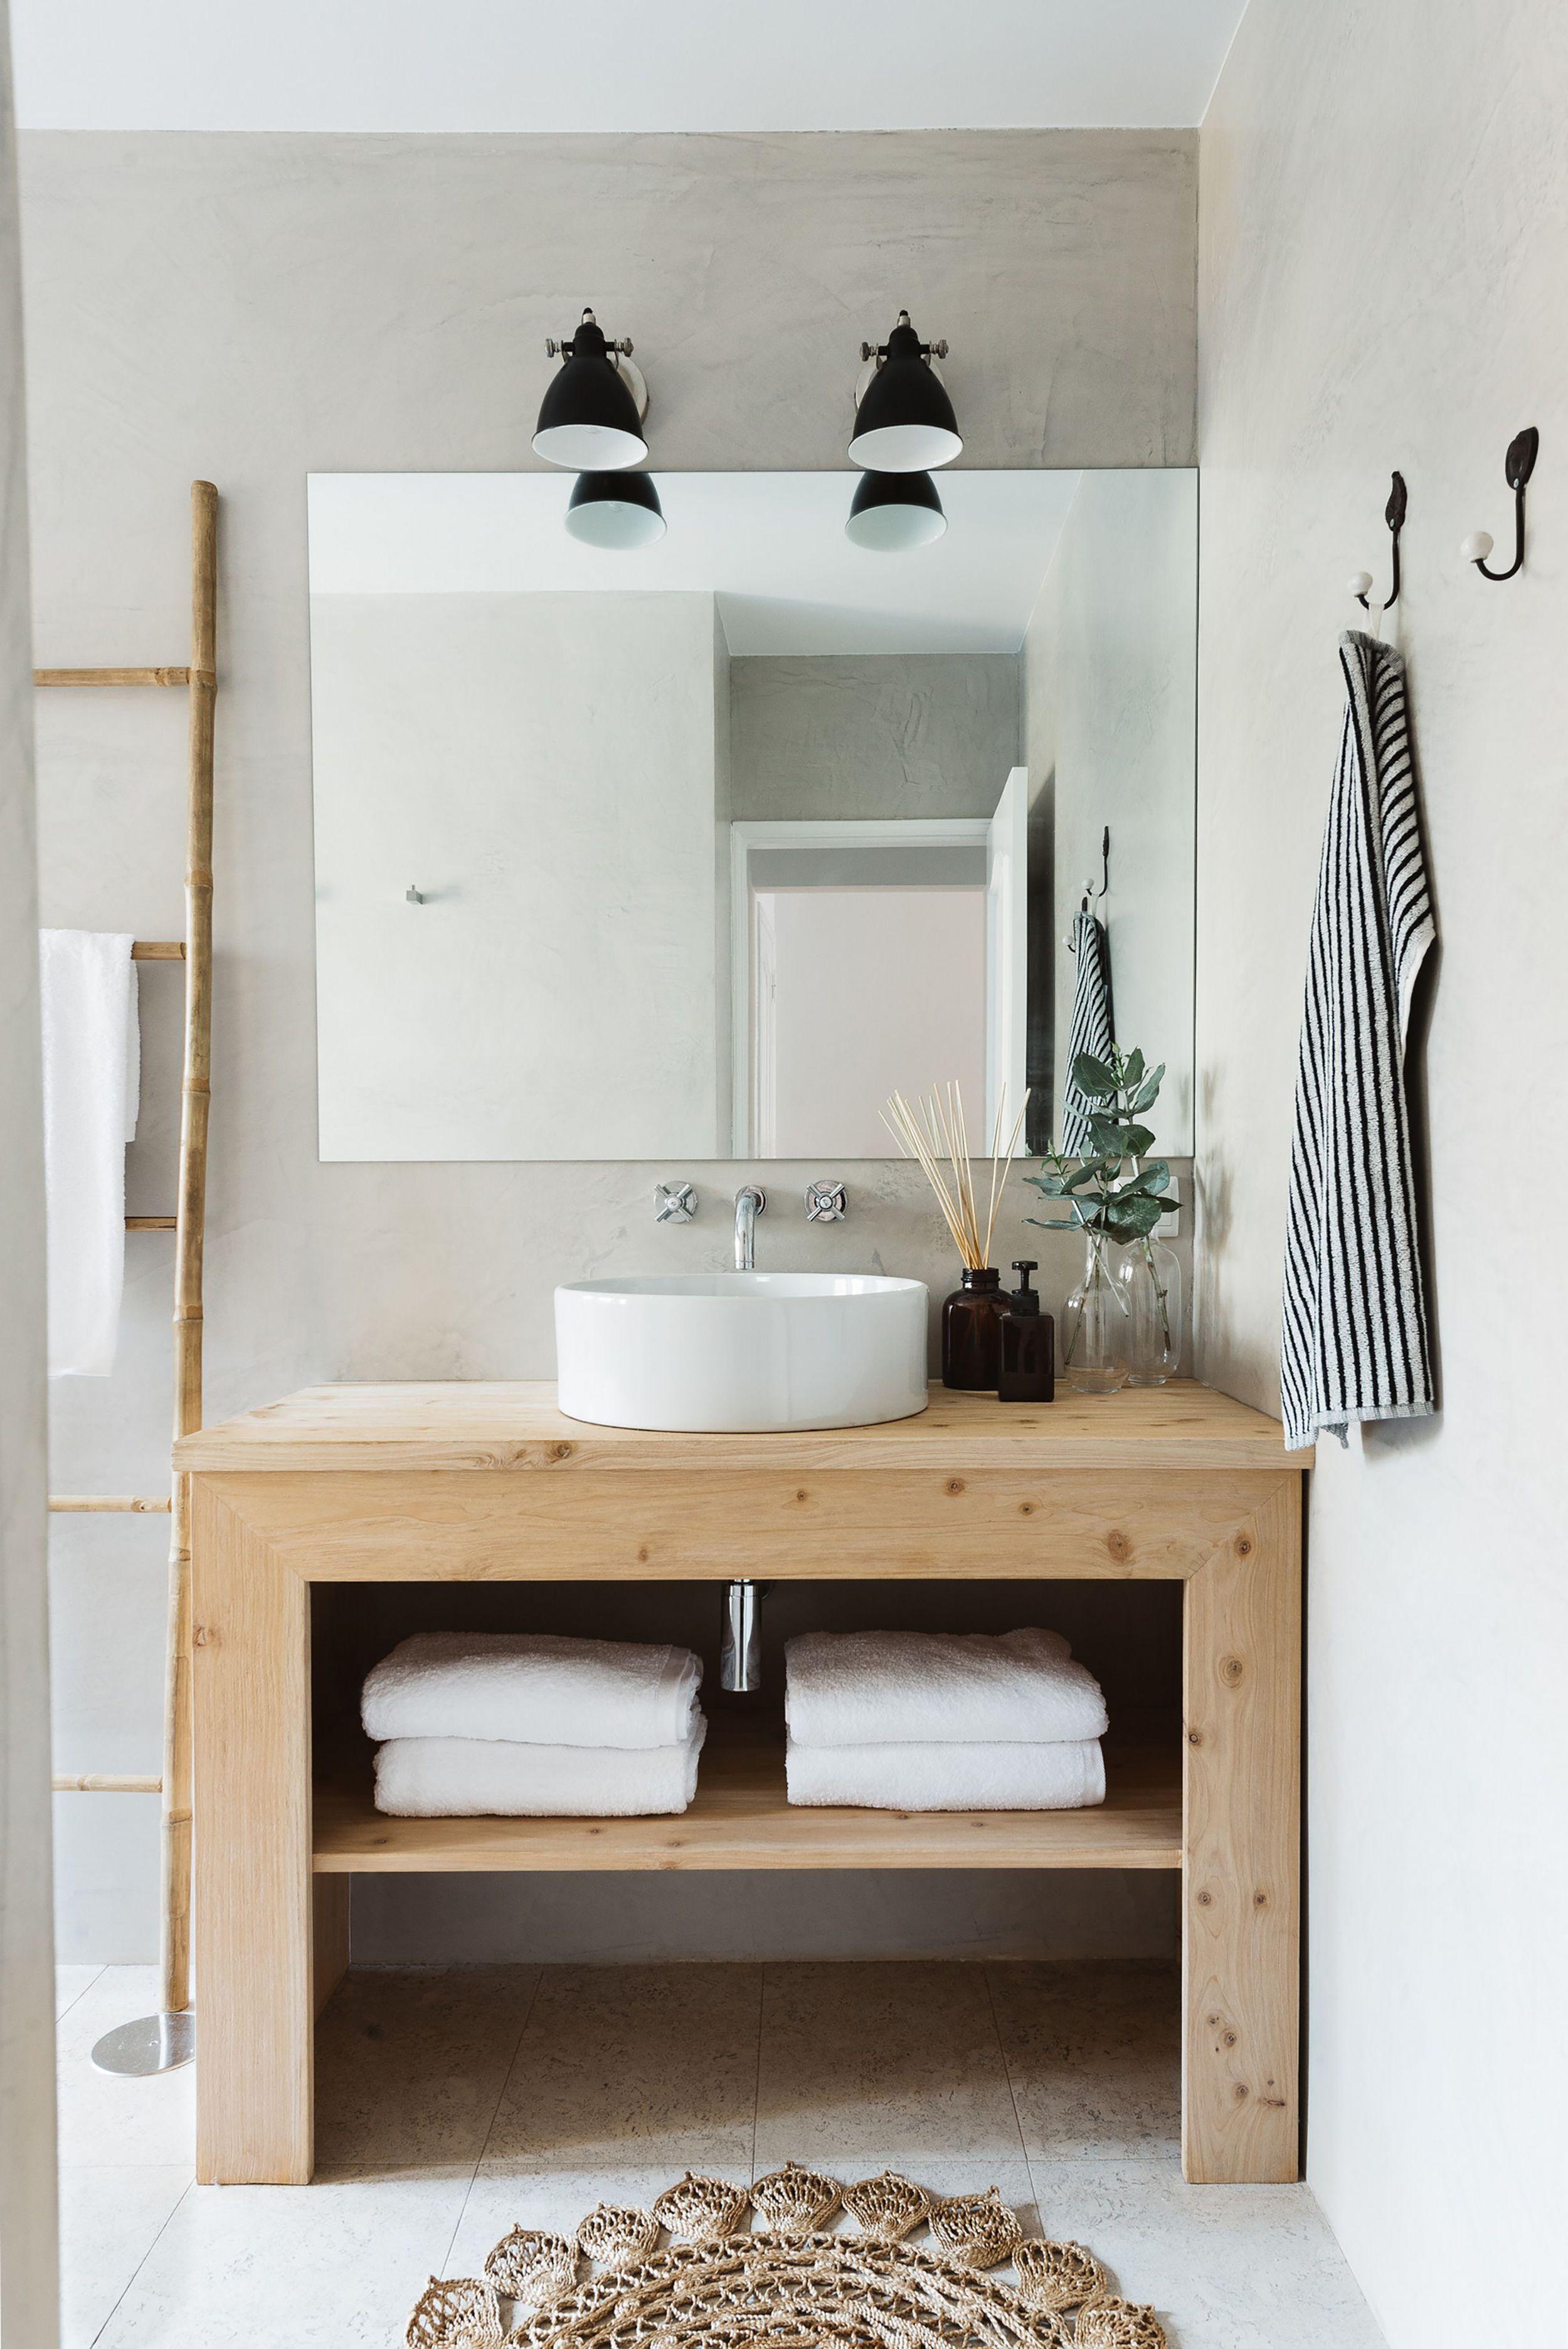 Let S Talk Vessel Sinks Wall Mount Faucets Emily Henderson Bathroom Design Trends Bathroom Design Bathroom Inspiration